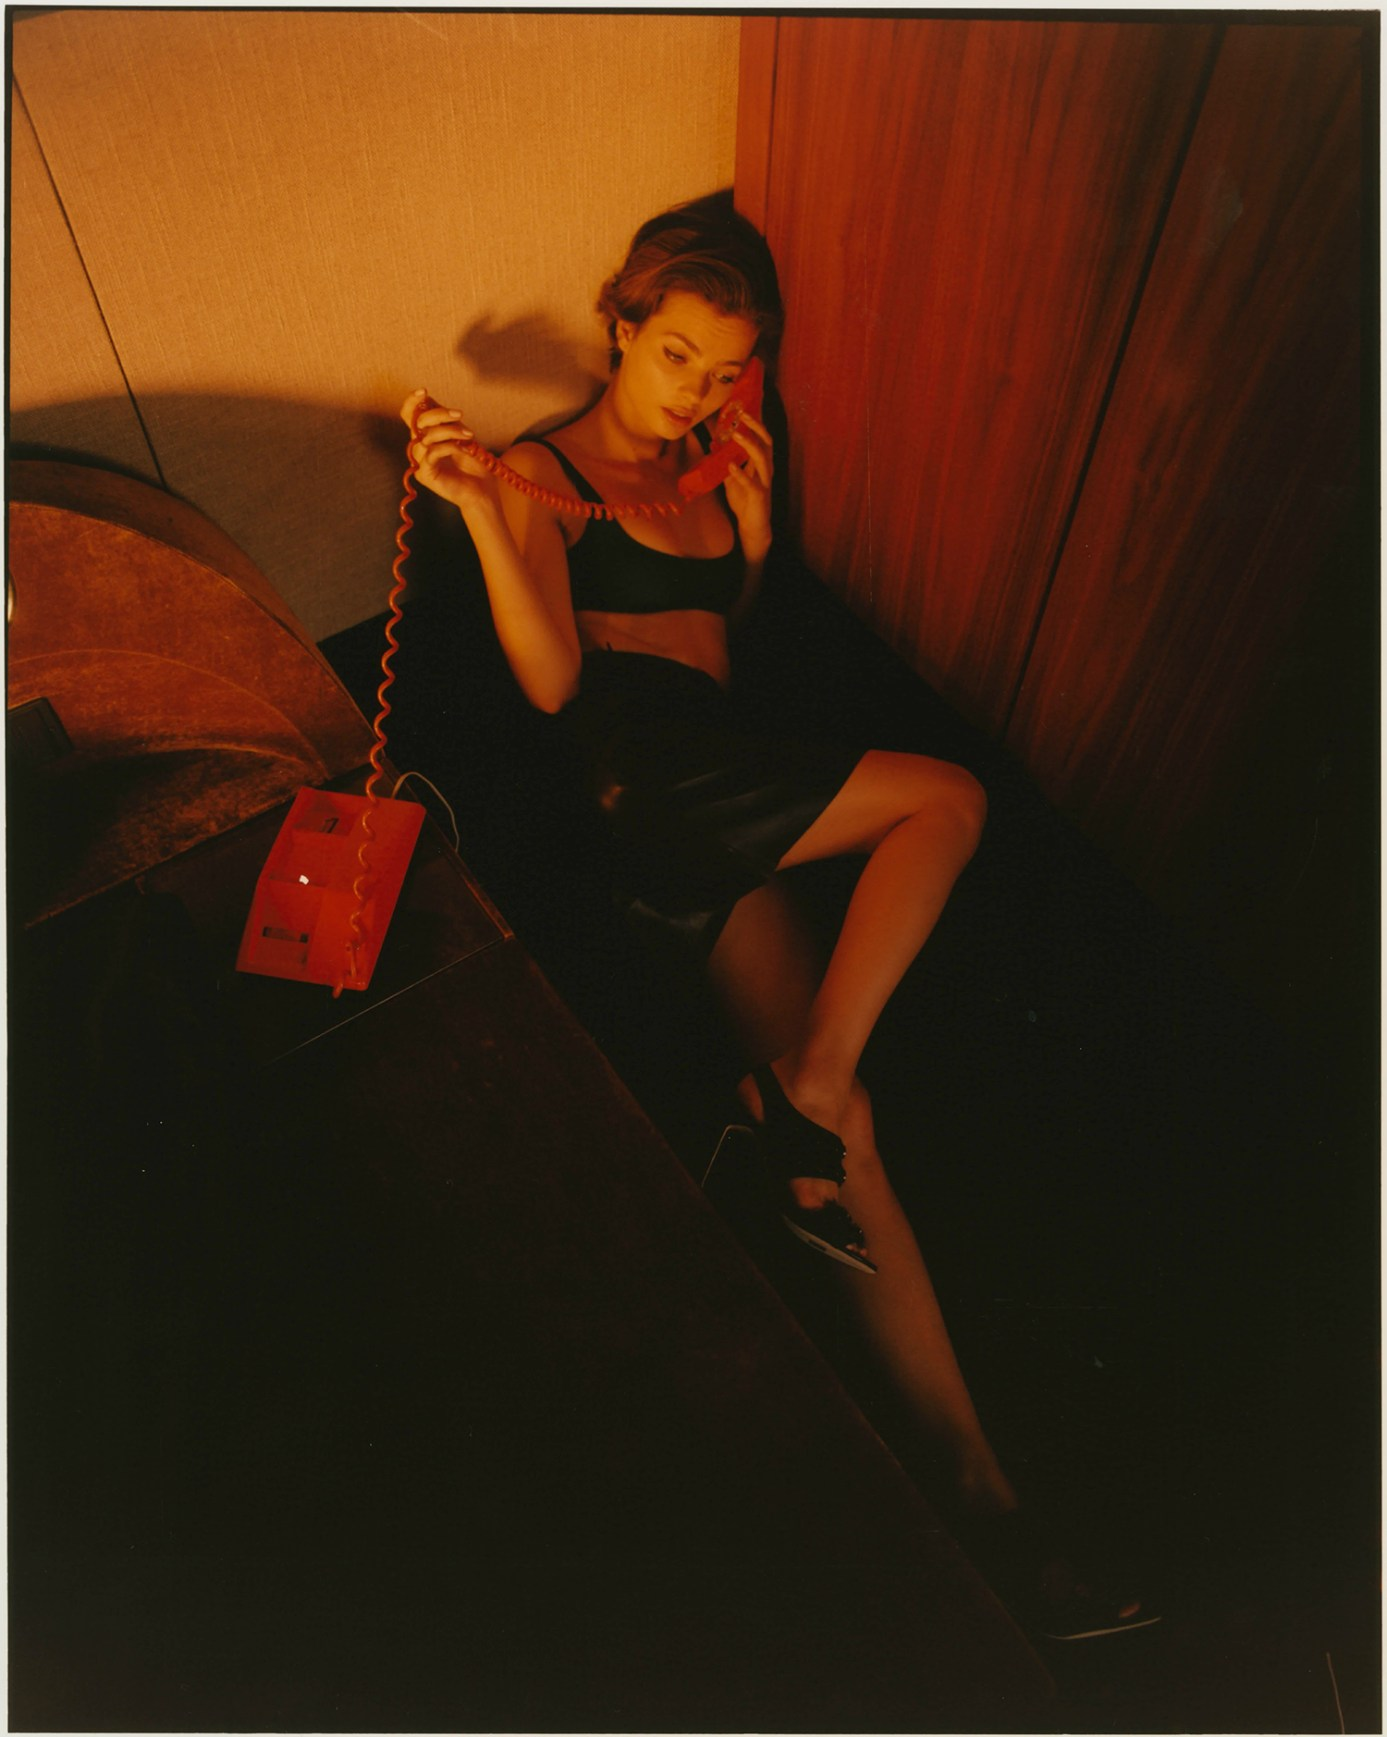 Ana Walczak Nude moa aberg - portraits of girls